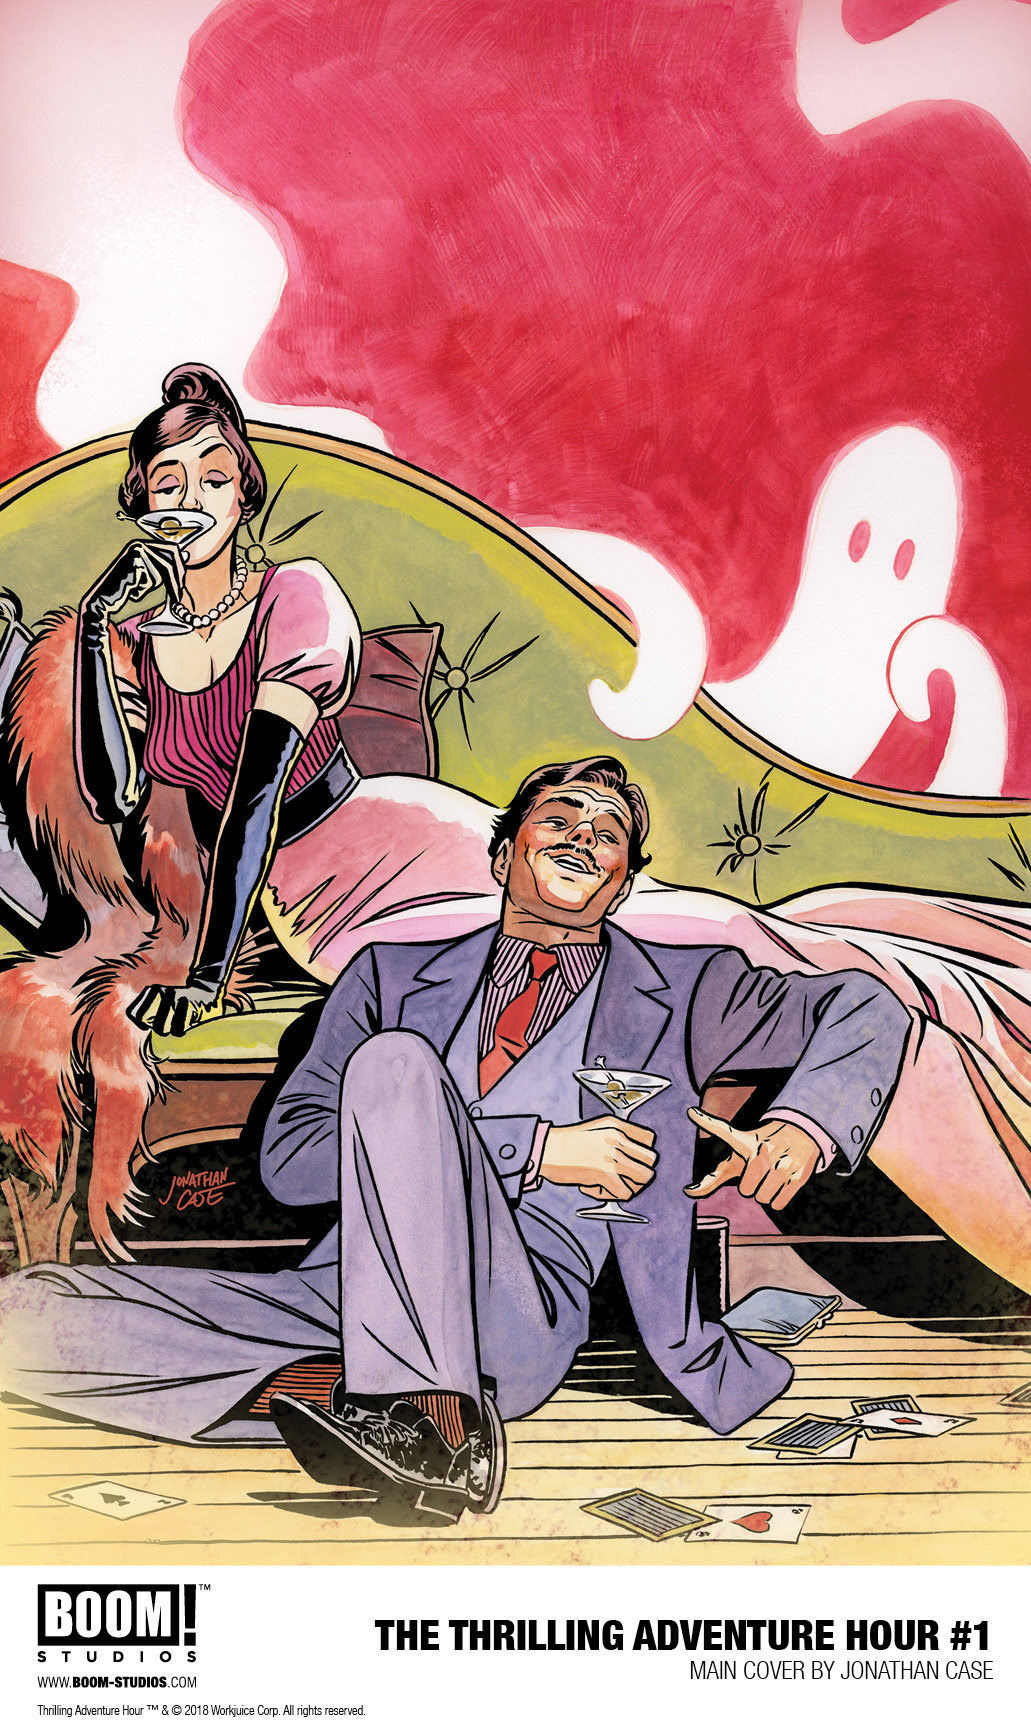 The Thrilling Adventure Hour comic